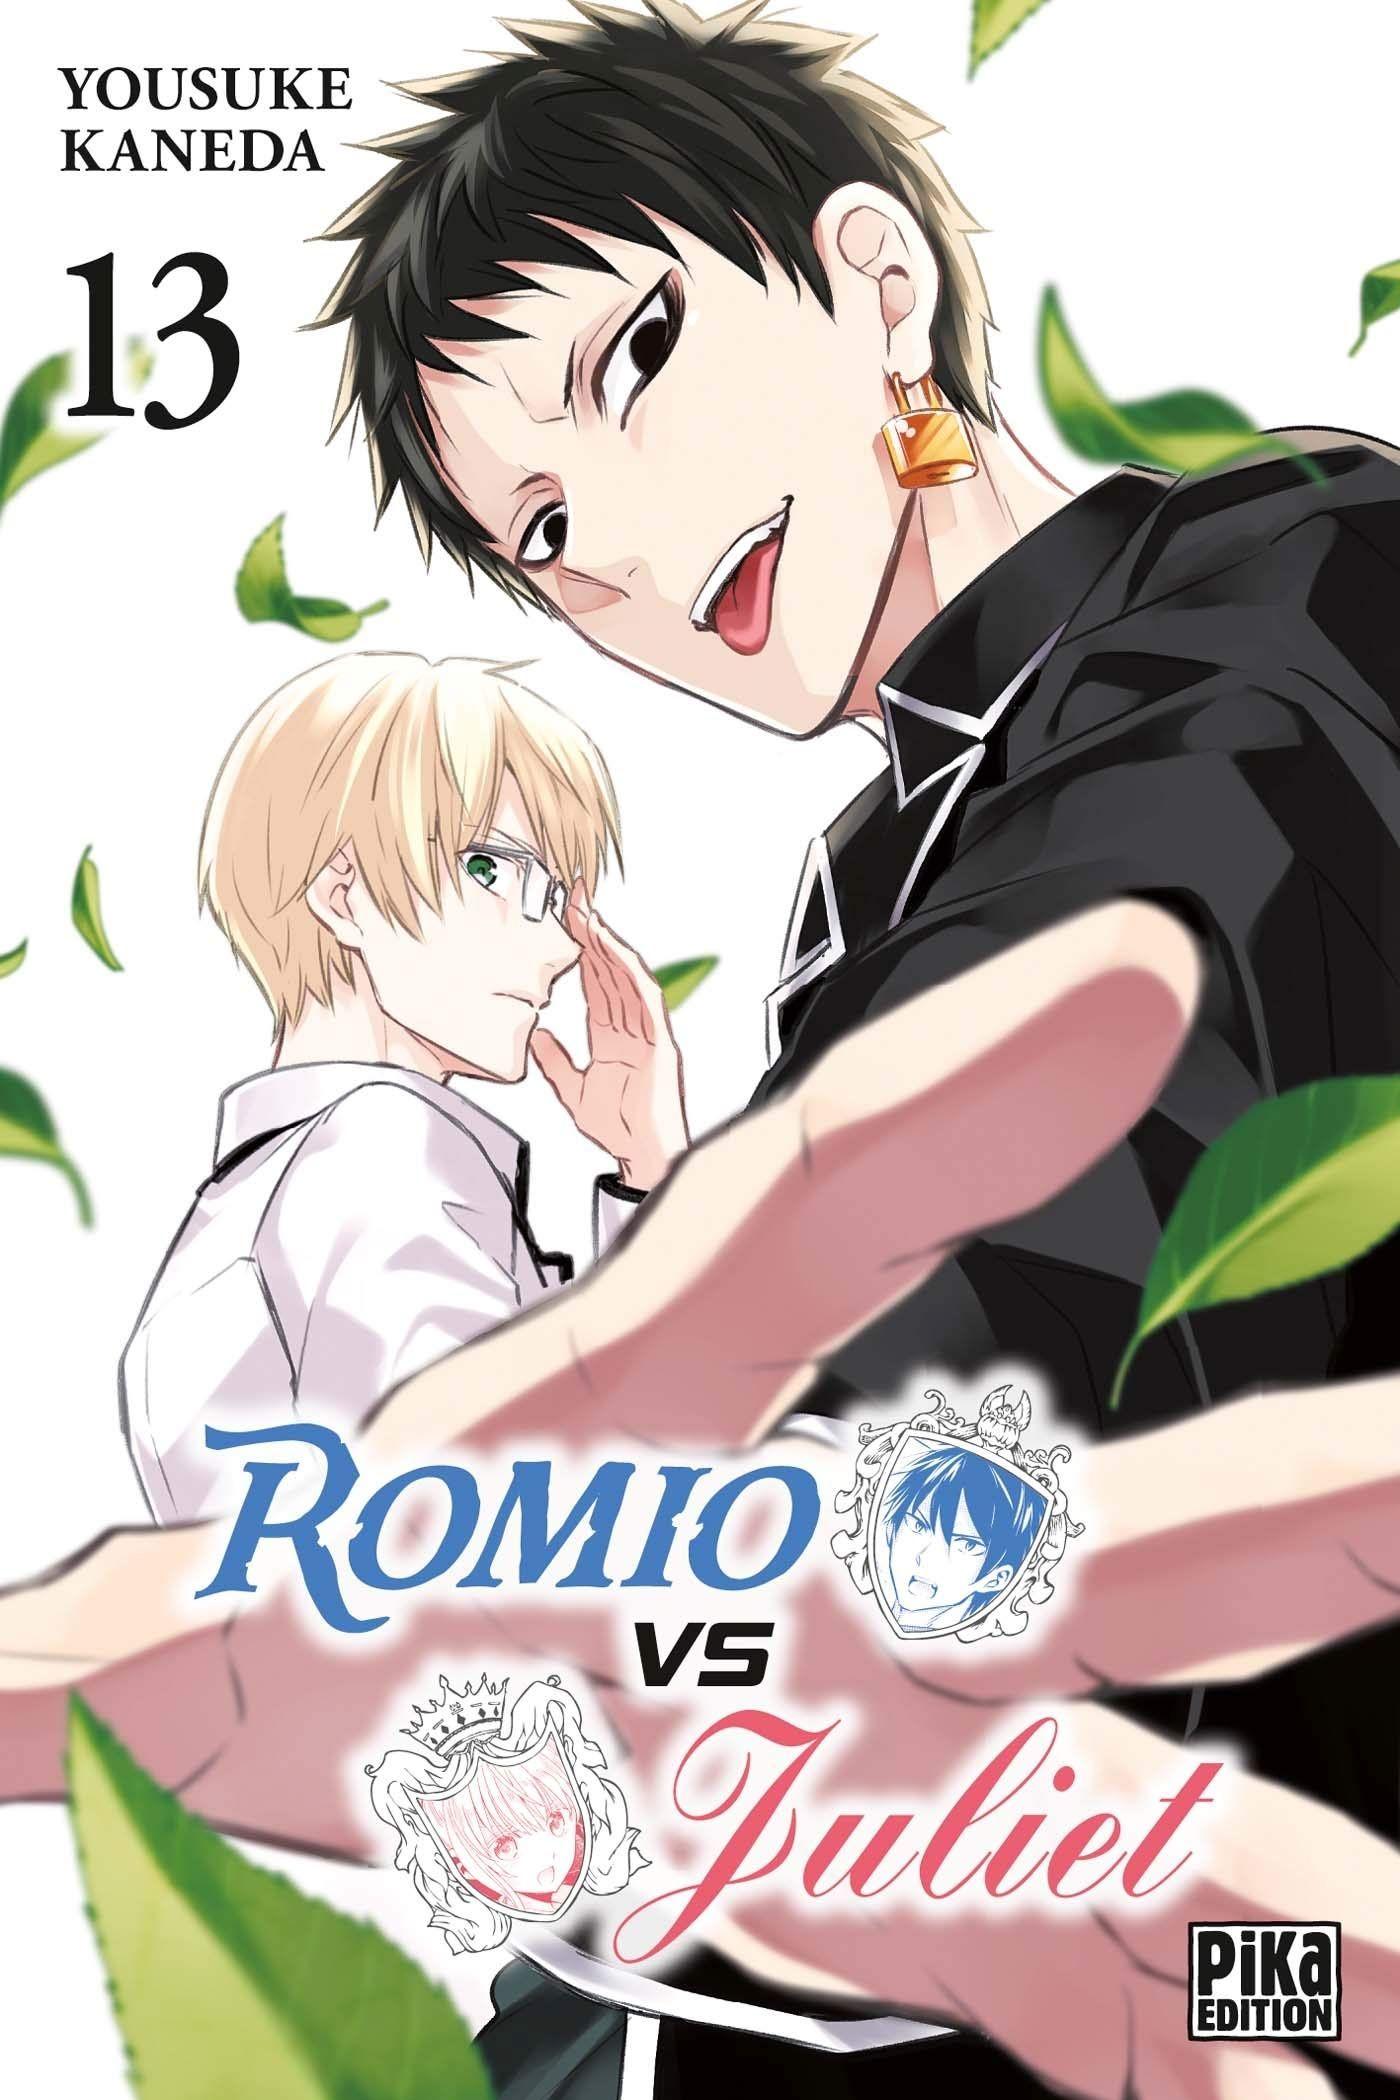 Sortie Manga au Québec JUILLET 2021 Romio-vs-juliette-13-pika